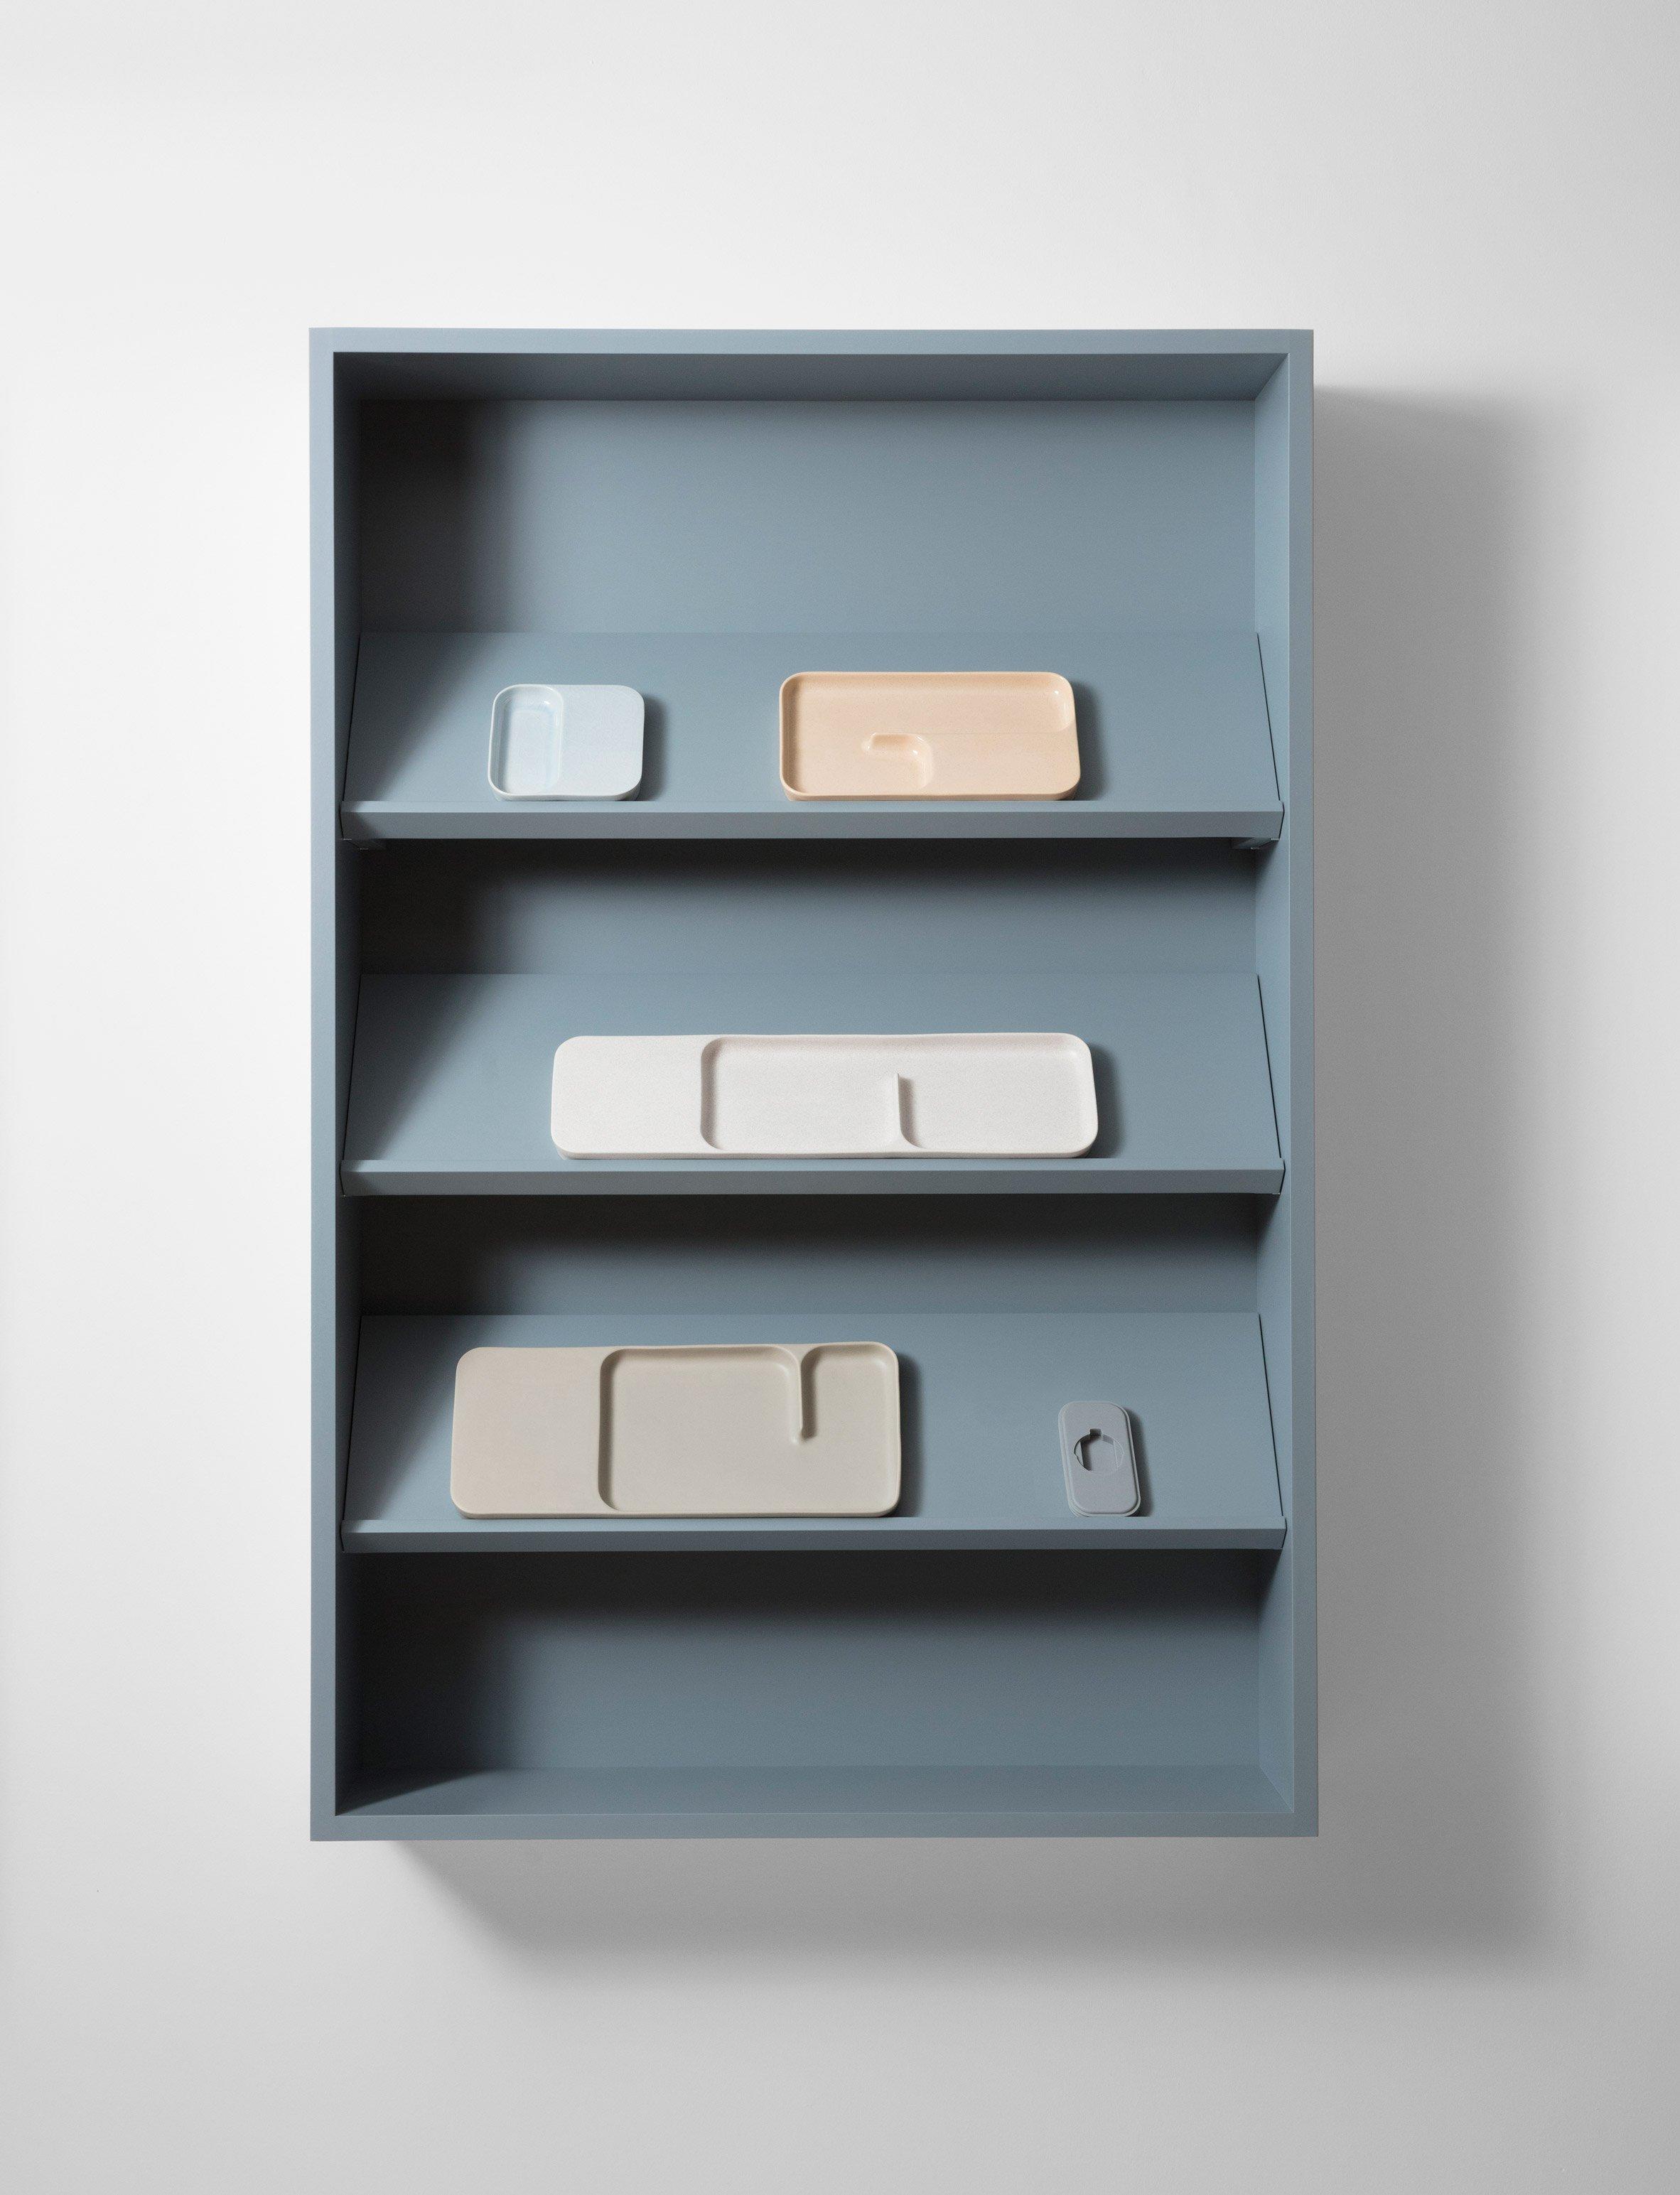 layer-self-designed-studio-interiors-offices-london-uk_dezeen_2364_col_6